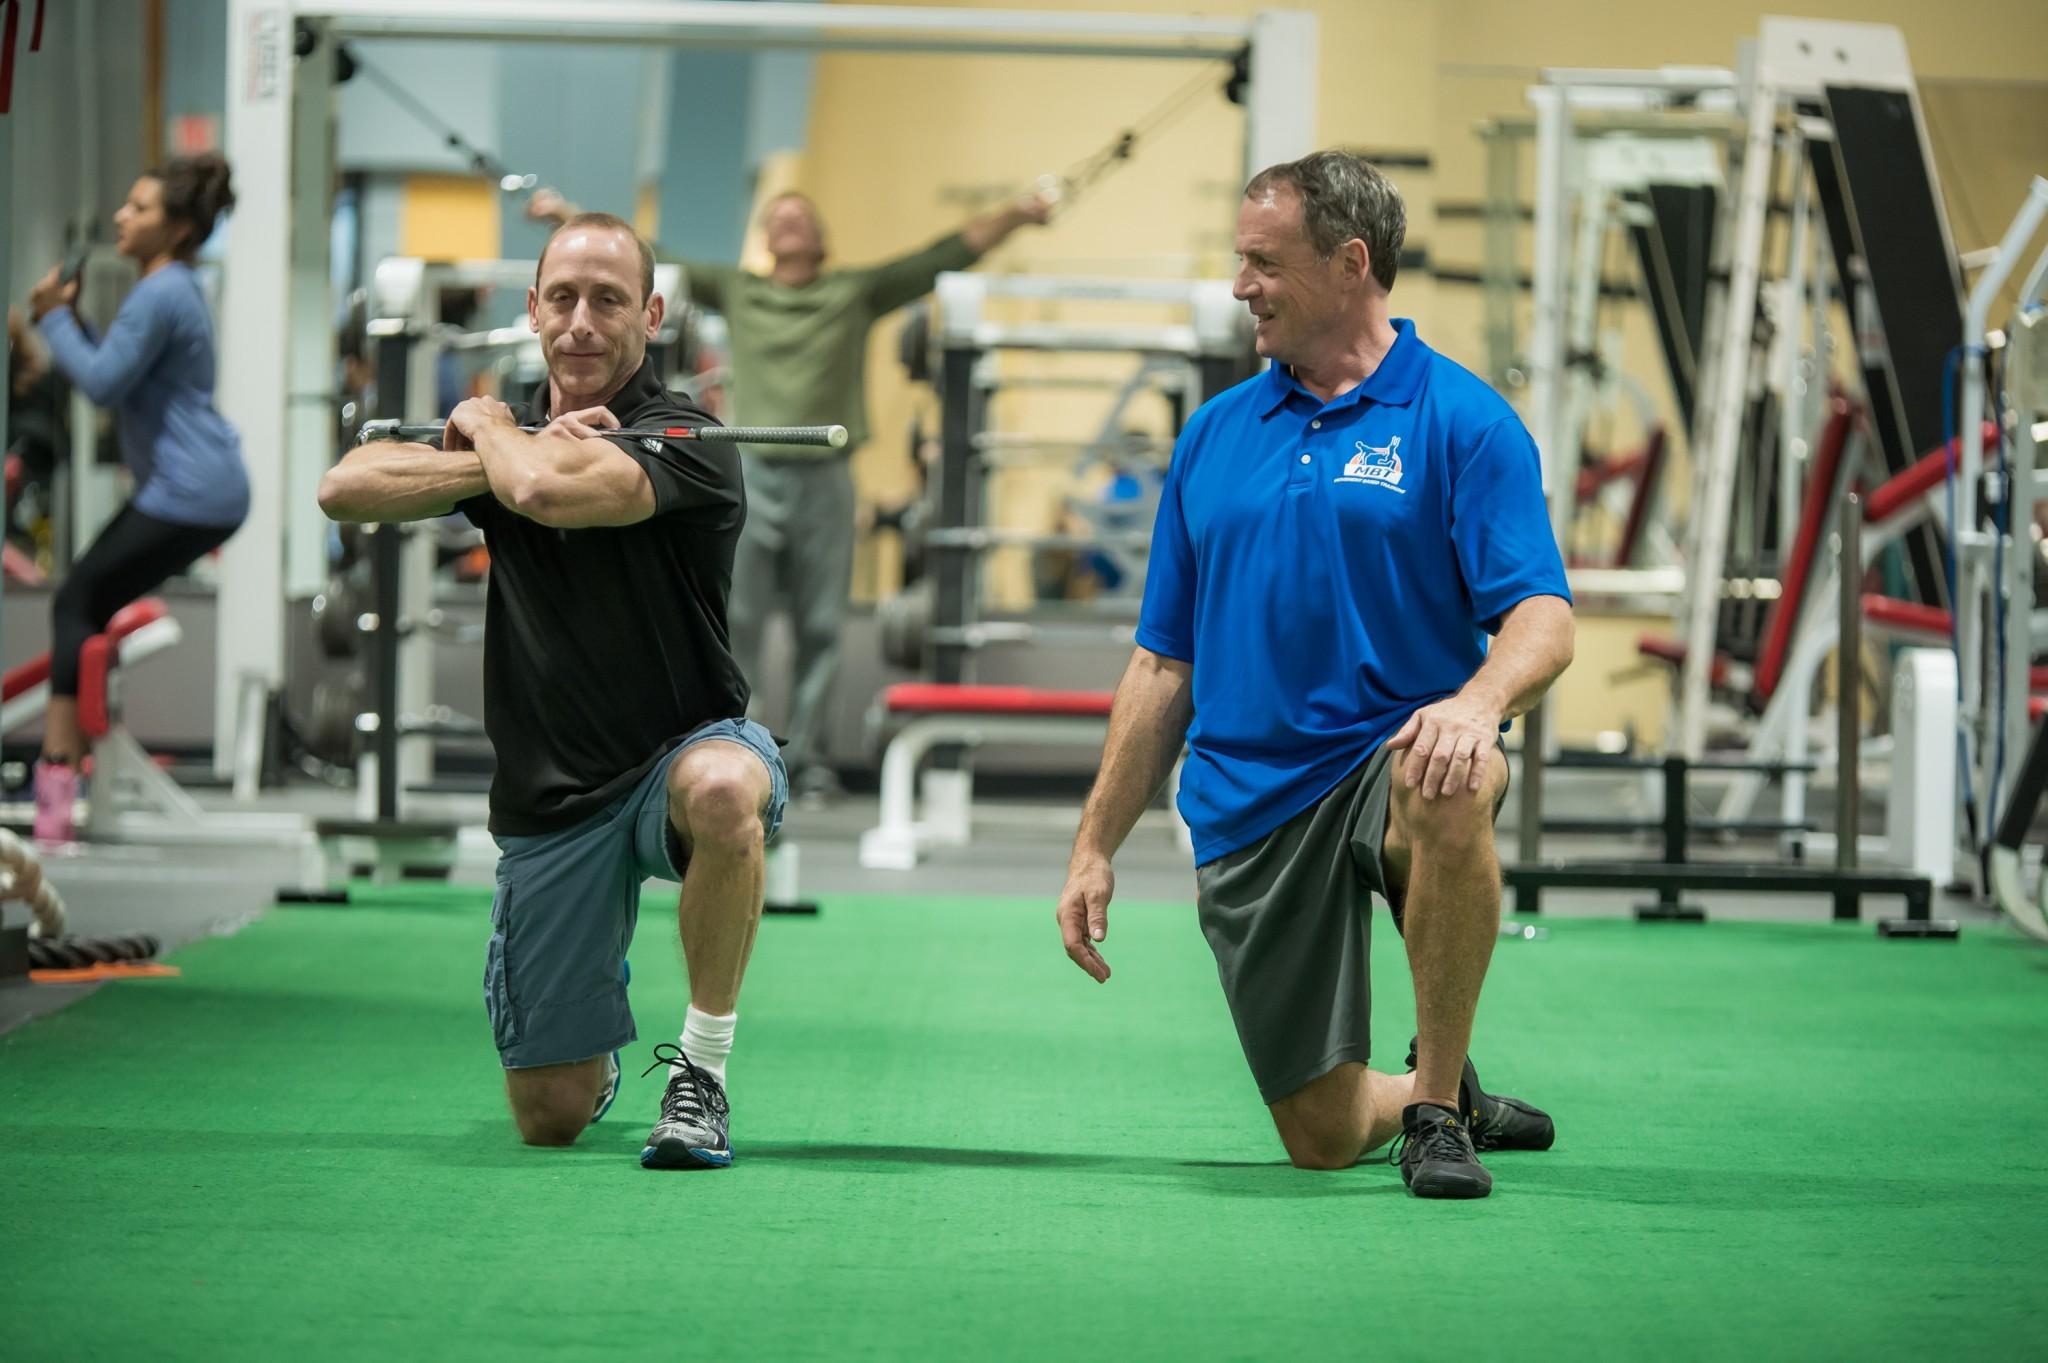 Corrective Exercise Post Rehab